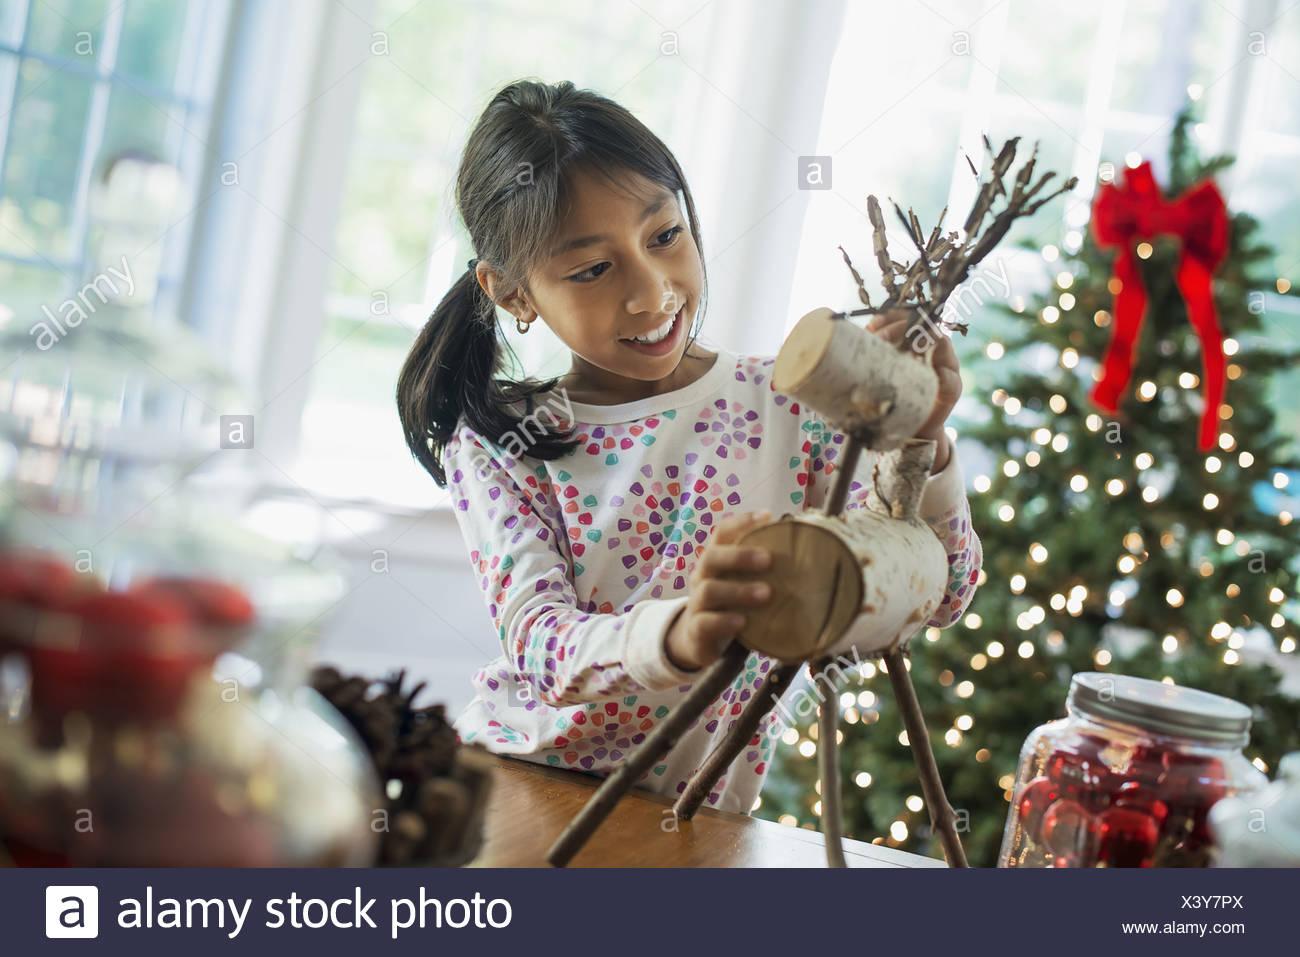 Woodstock New York USA twig figure reindeer making Christmas decorations - Stock Image